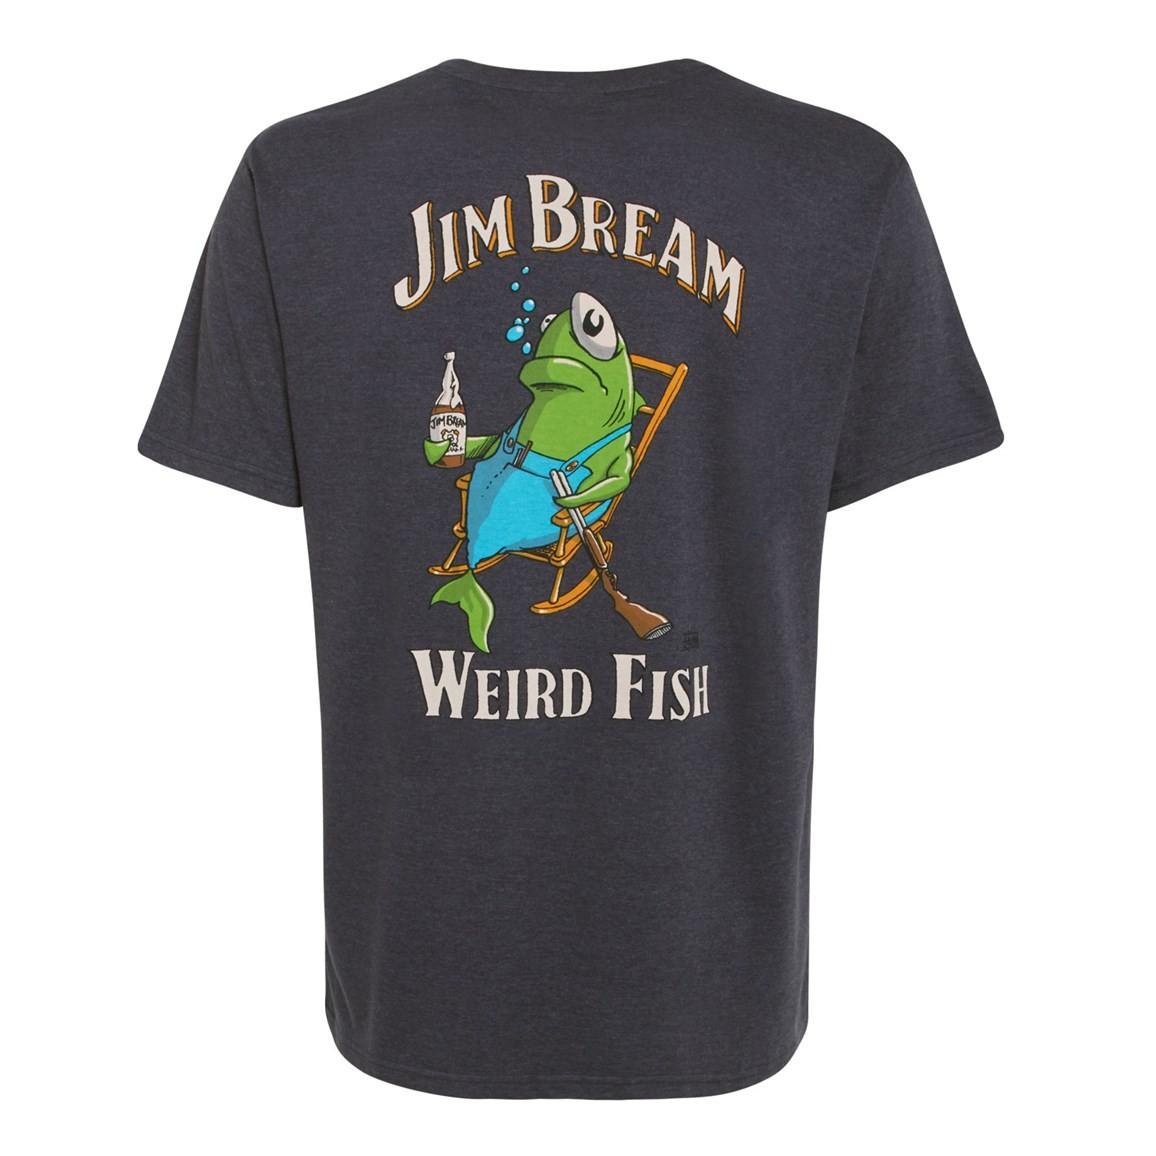 Jim Bream Printed Artist T-Shirt Ebony Marl